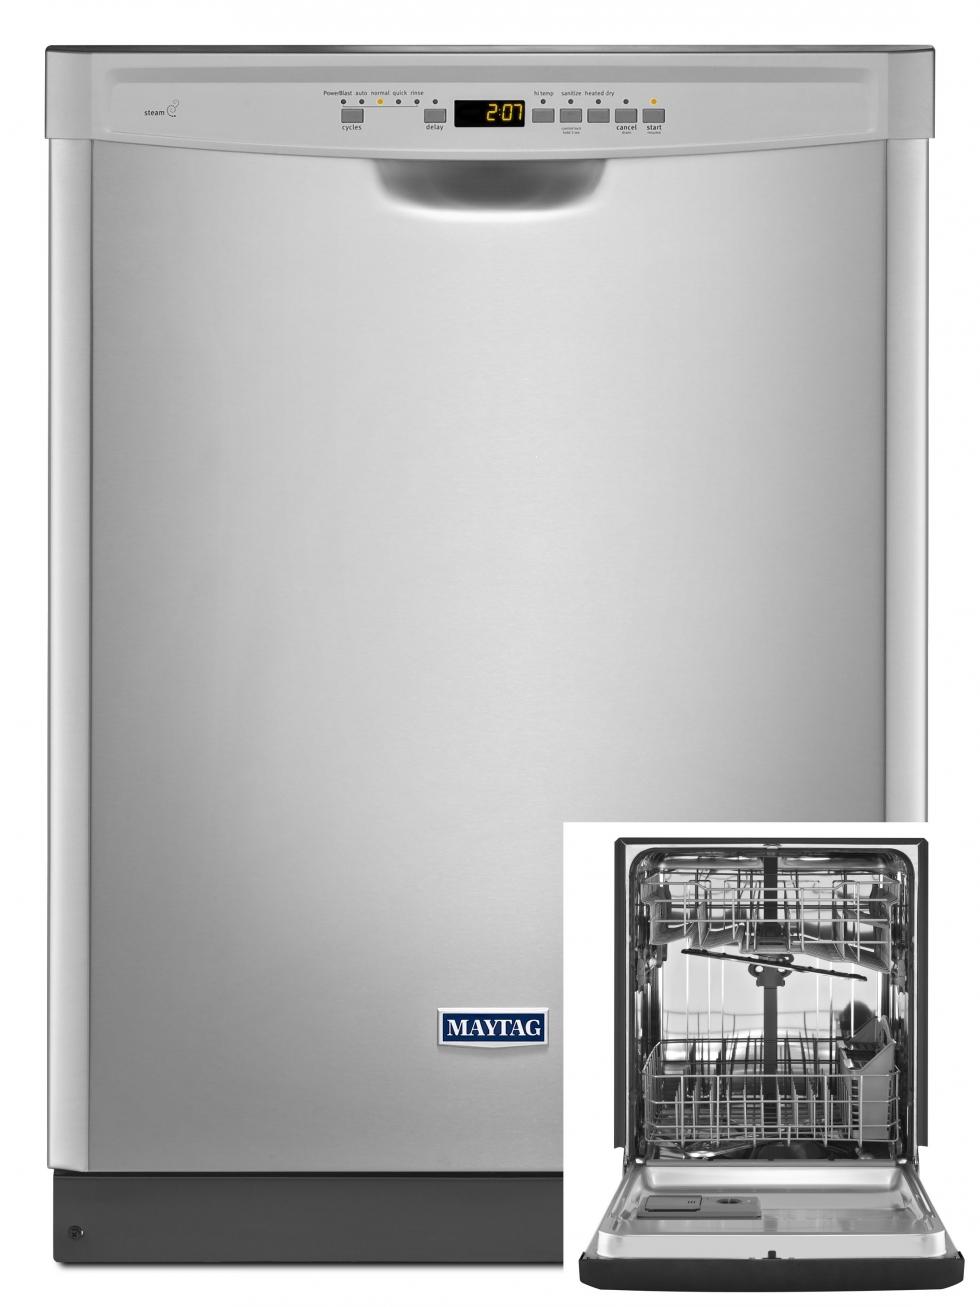 Maytag Stainless Steel Tub Dishwasher Start Saving Today